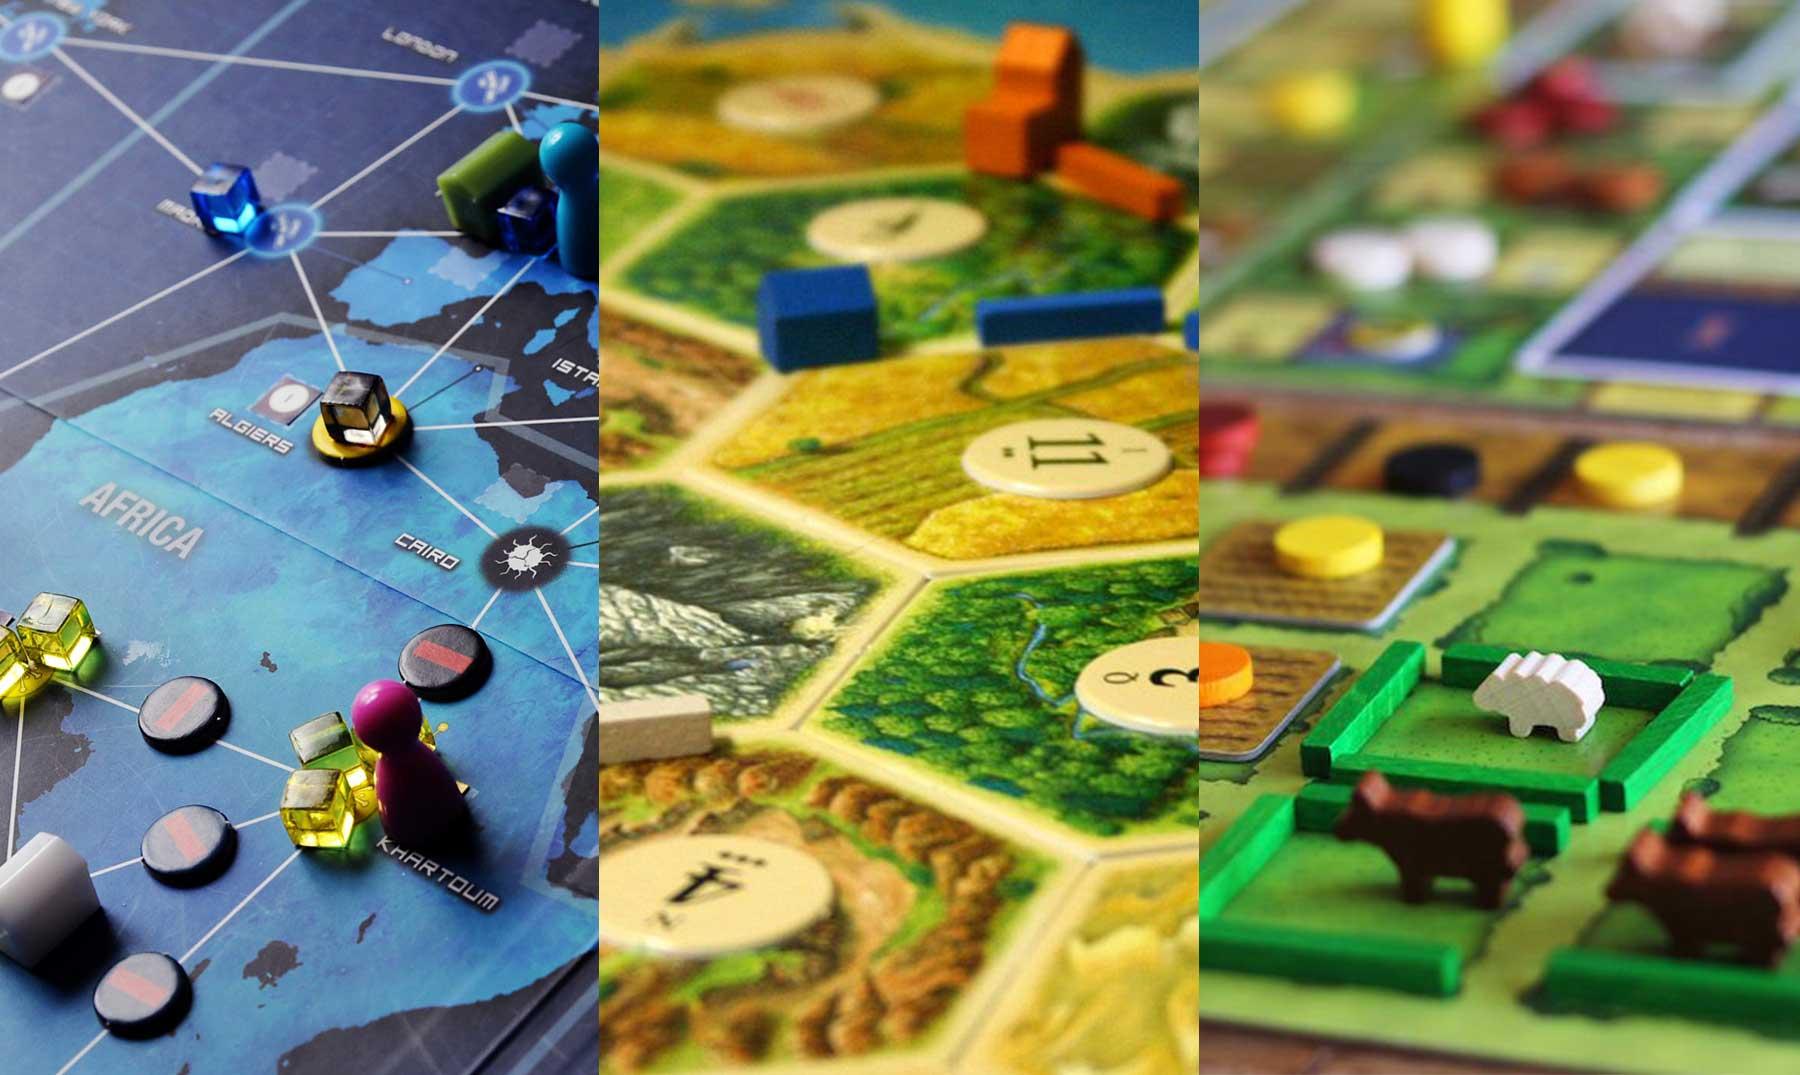 8df0c5e5917c 10 Juegos de mesa de estrategia que deberías probar